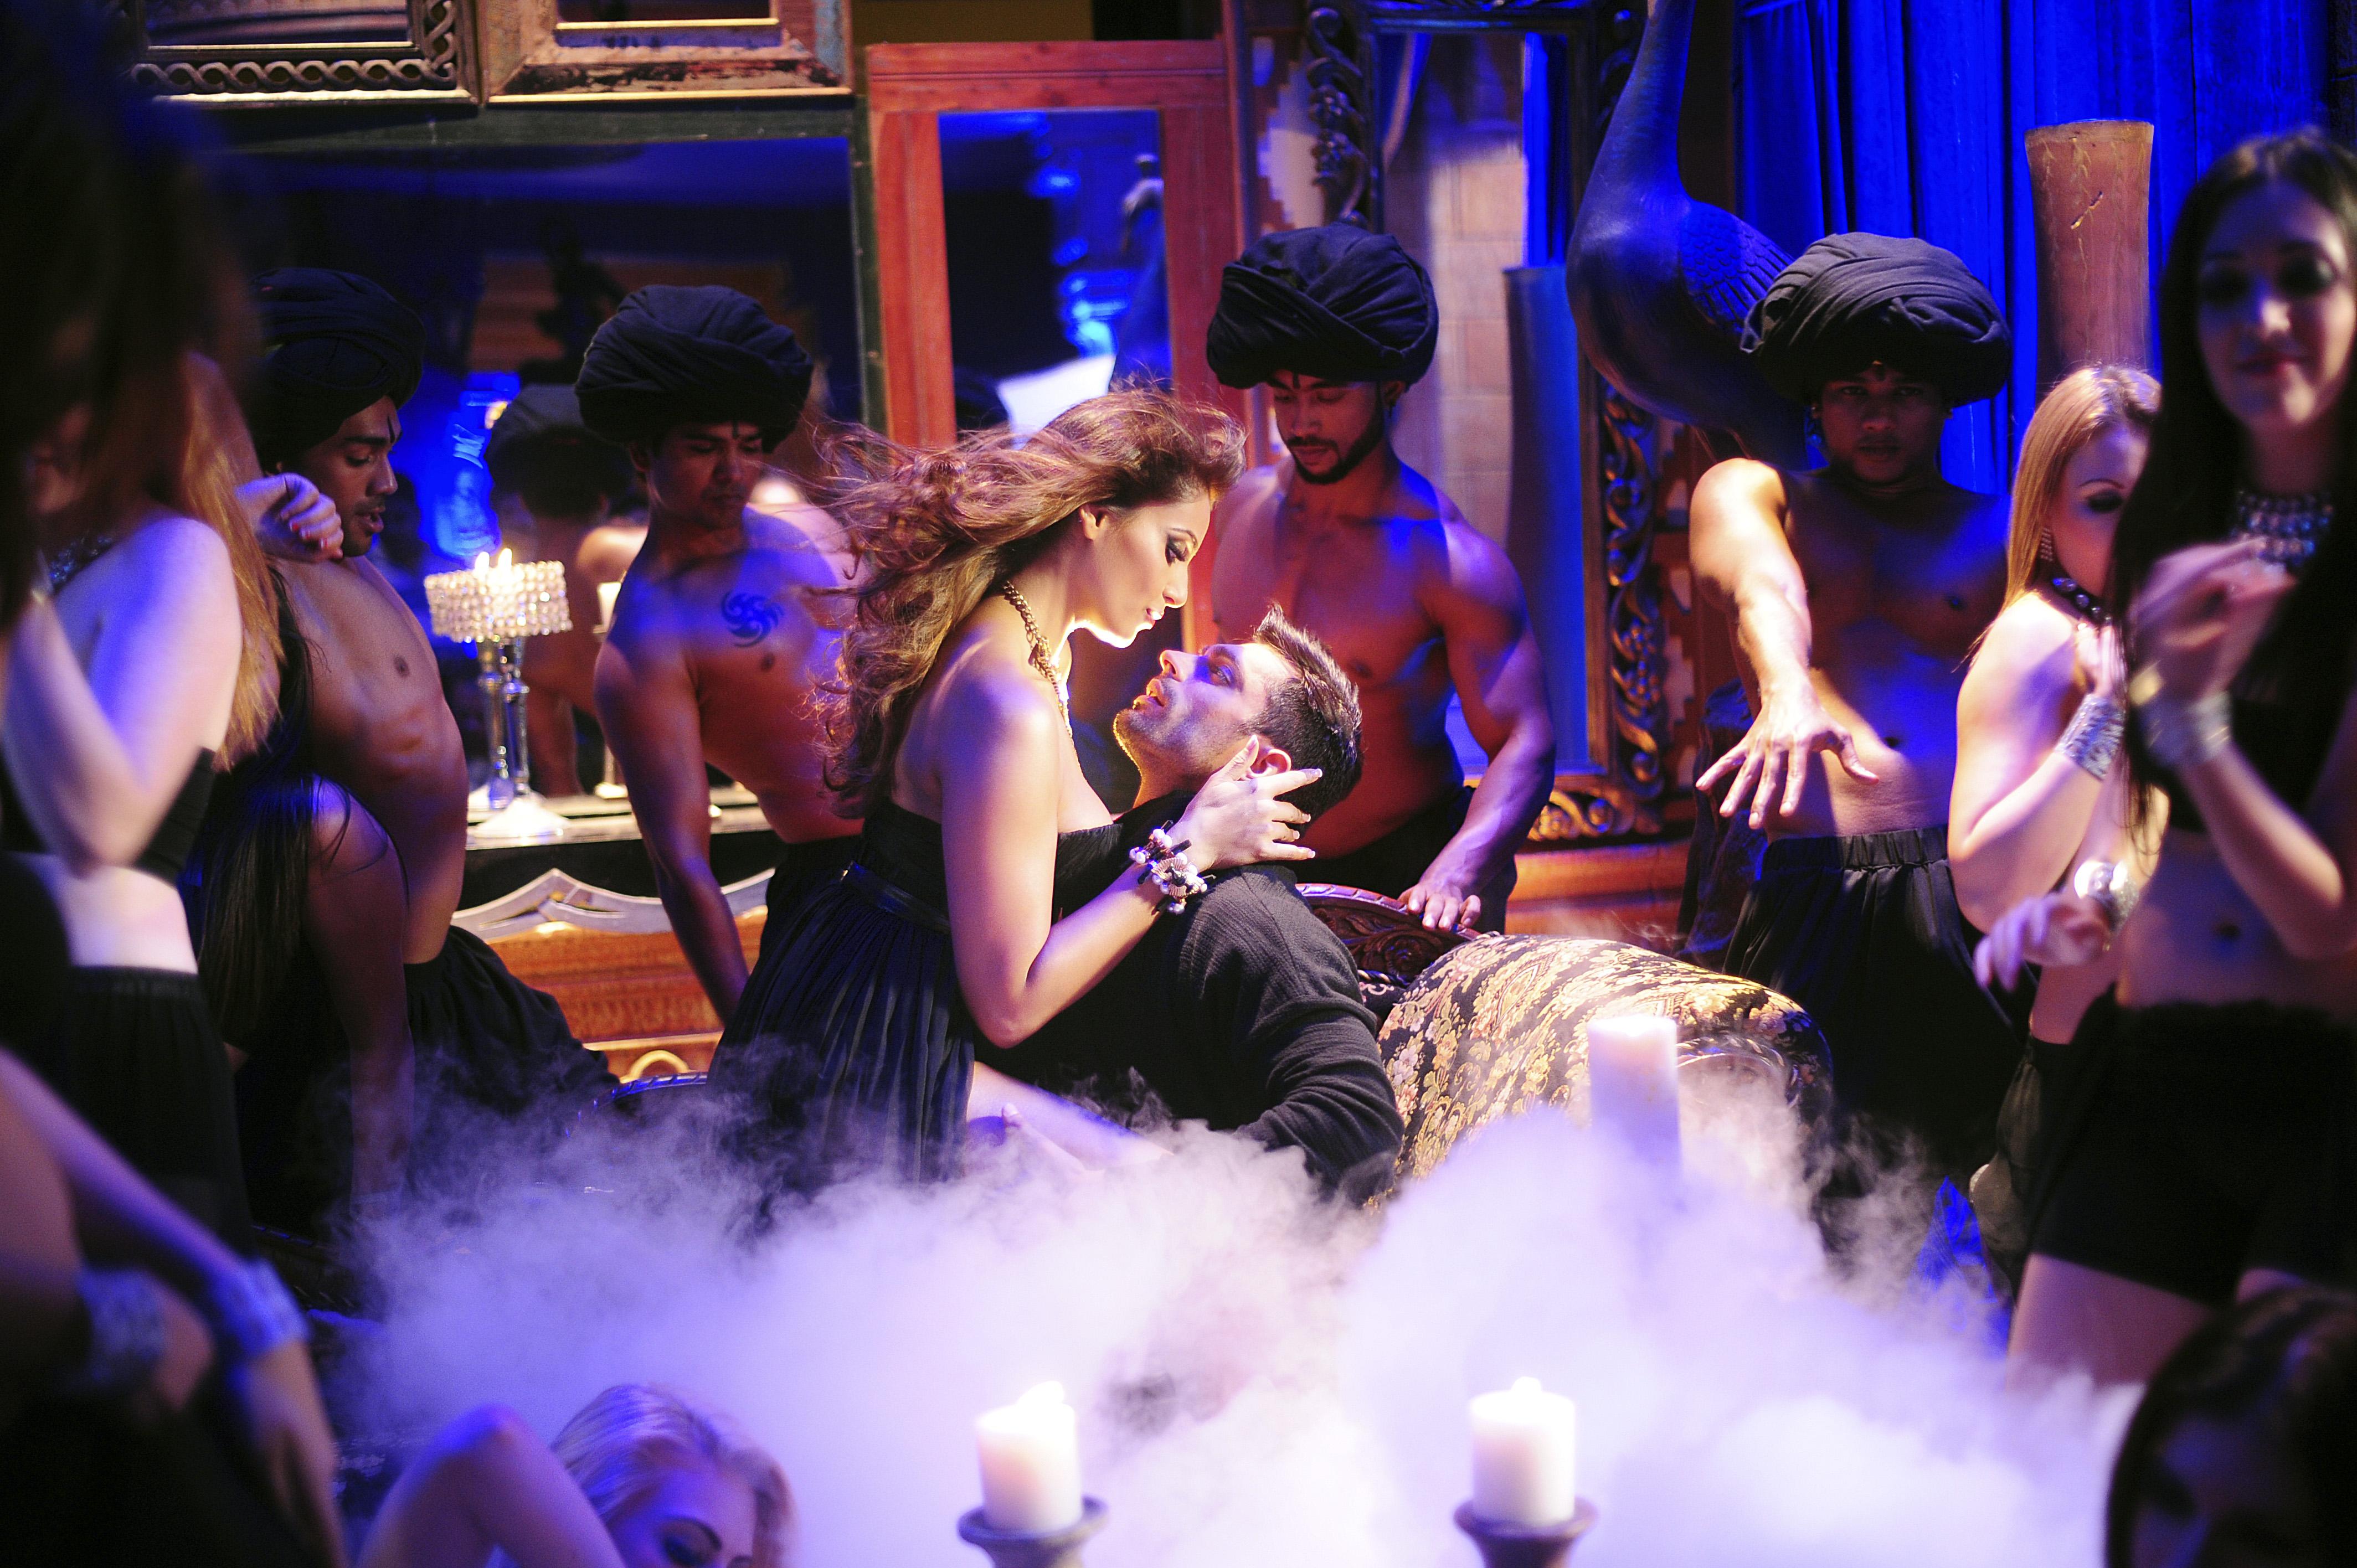 Bipasha Hot Video bipasha basu and karan singh grover sizzle in touch my body